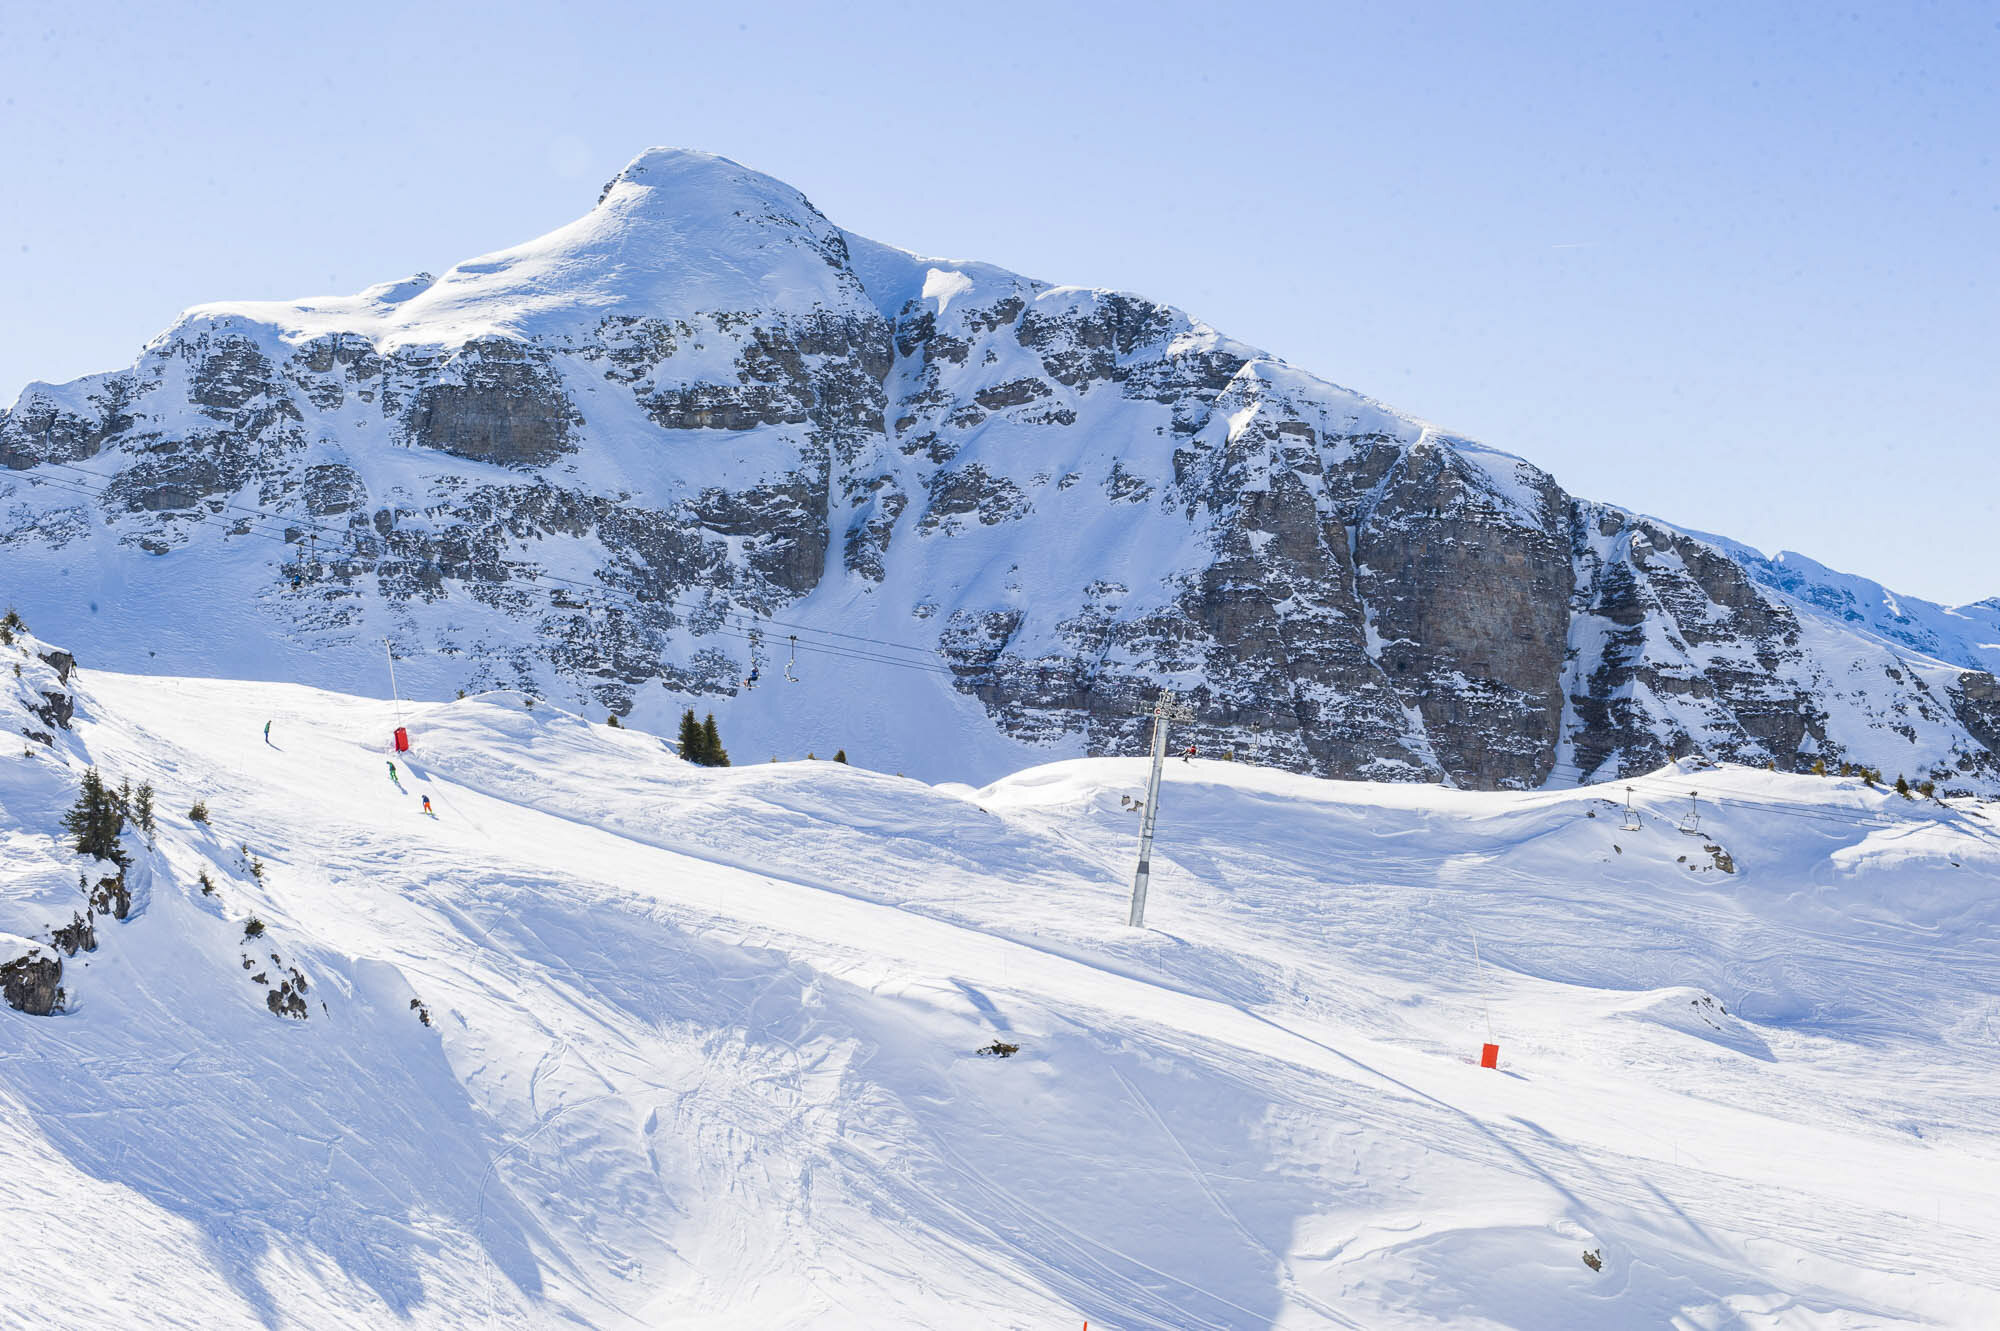 ski-chalet-holiday-mountains-landscape-tgski-052.jpg